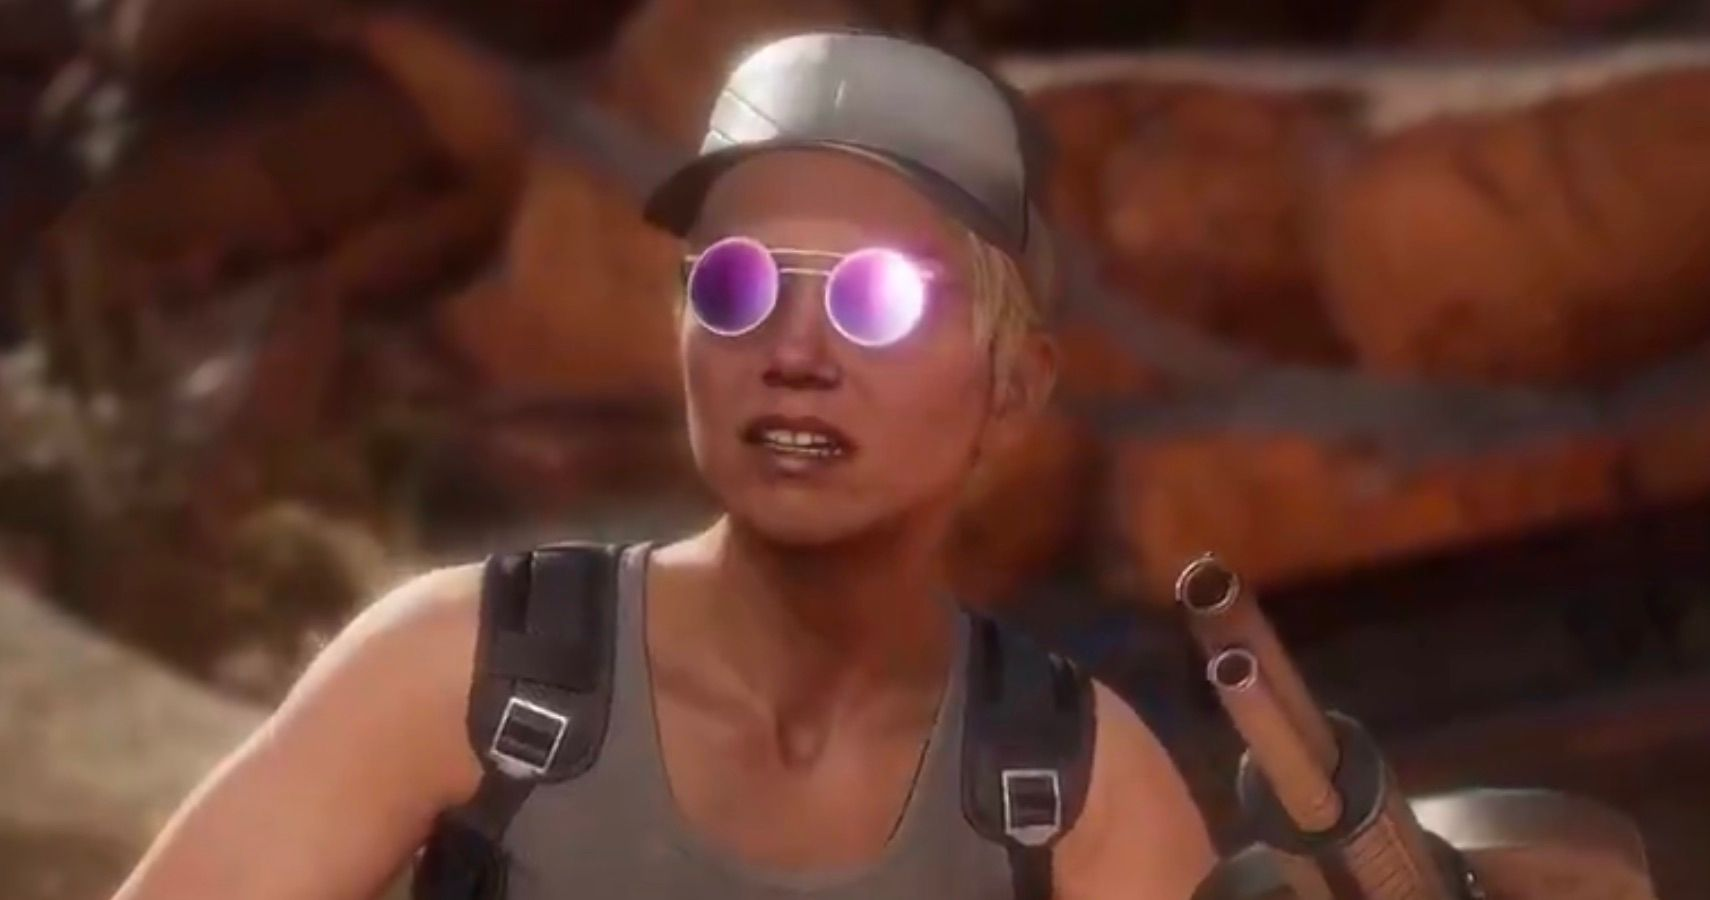 Sonya Blade Getting A Sarah Connor Skin In Mortal Kombat 11